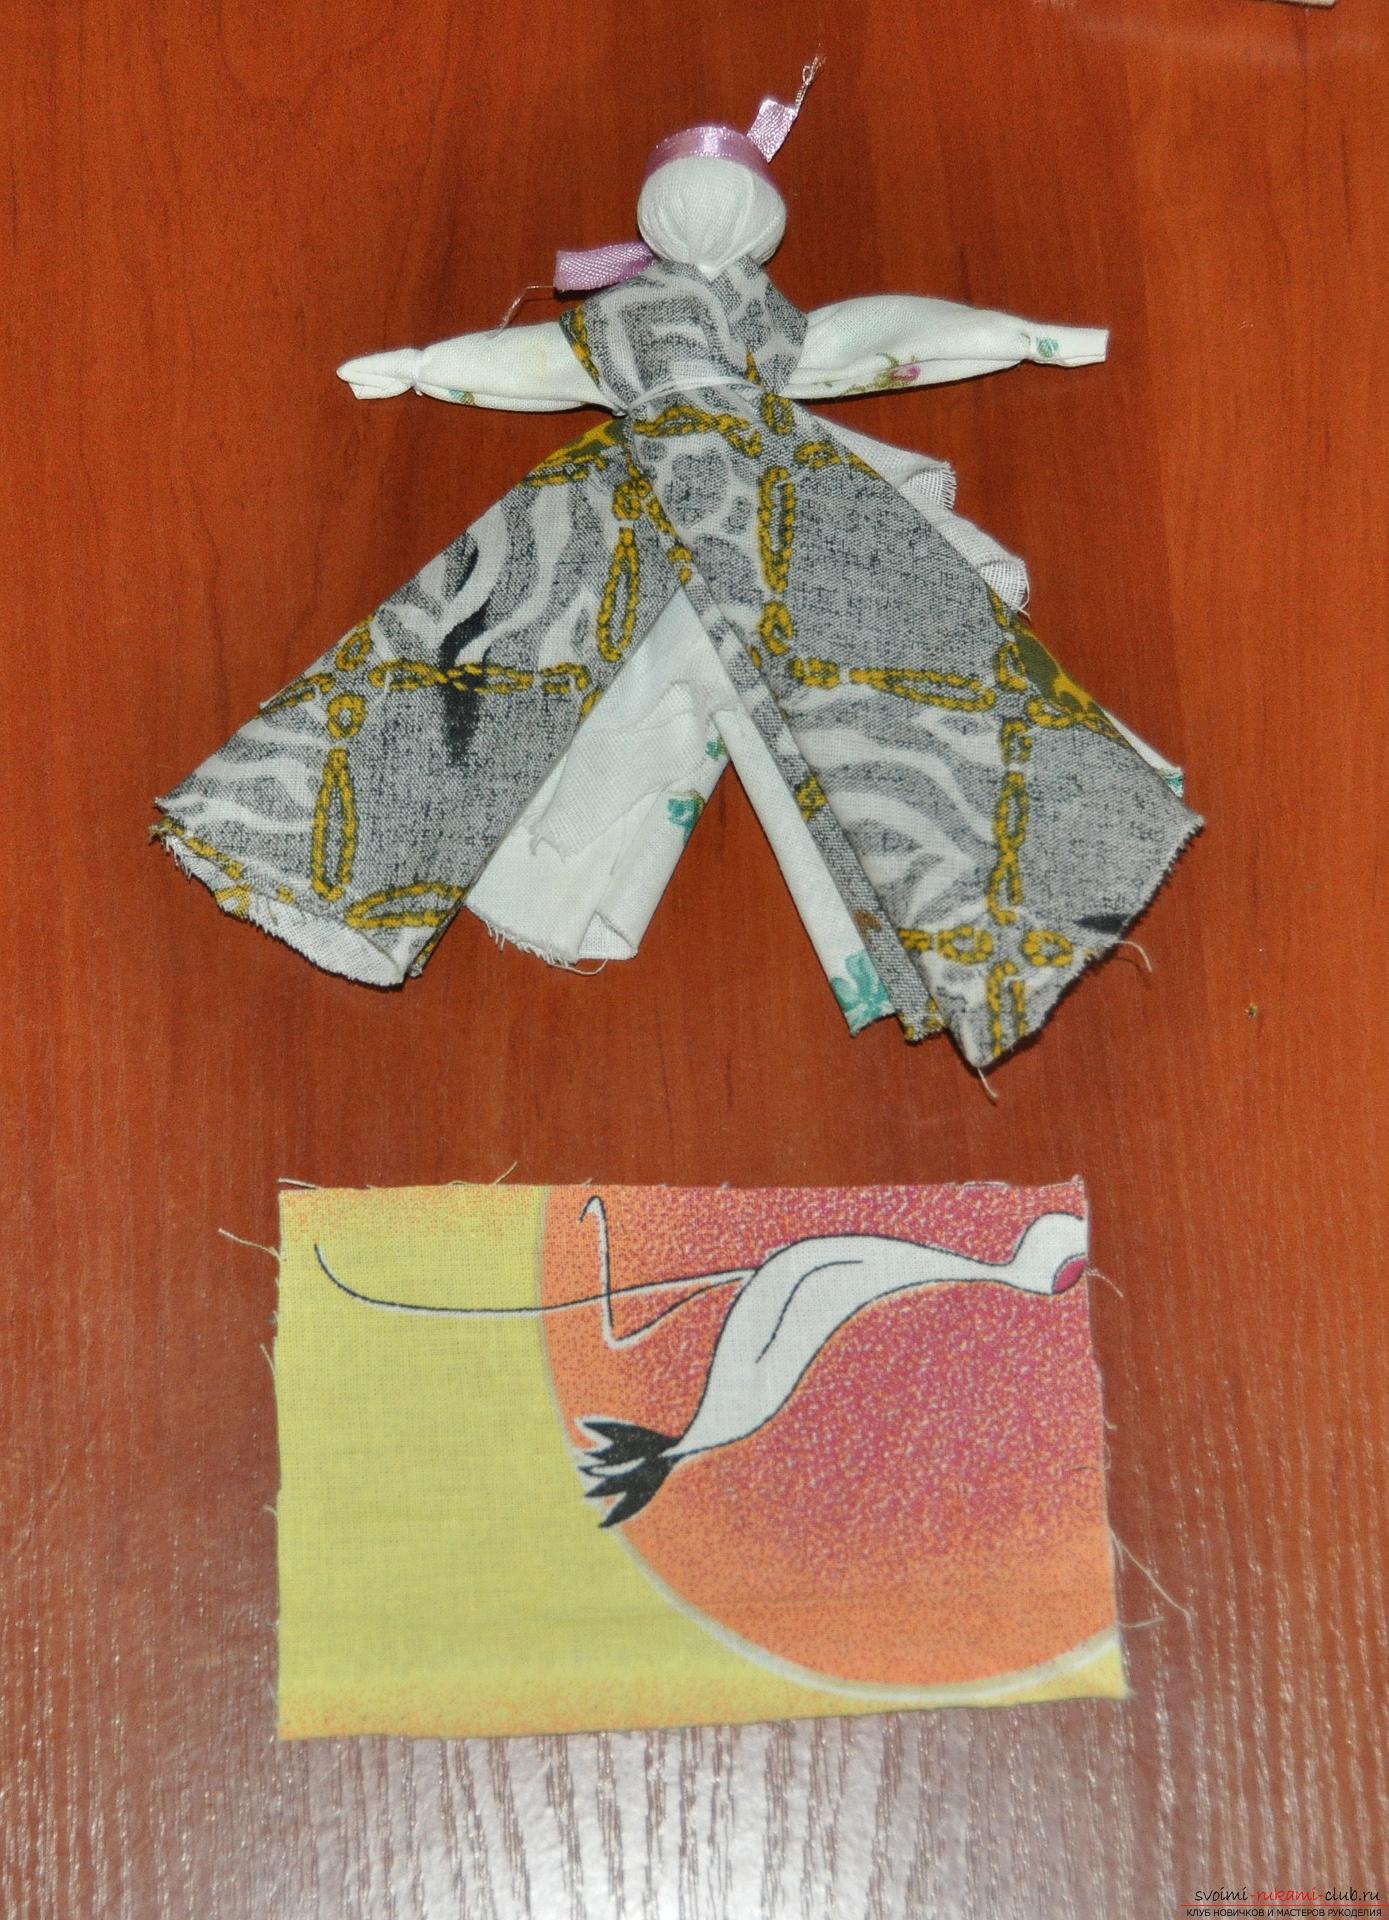 Этот мастер-класс научит как изготовить своими руками куклу-берегиню - столбушку. Фото №21